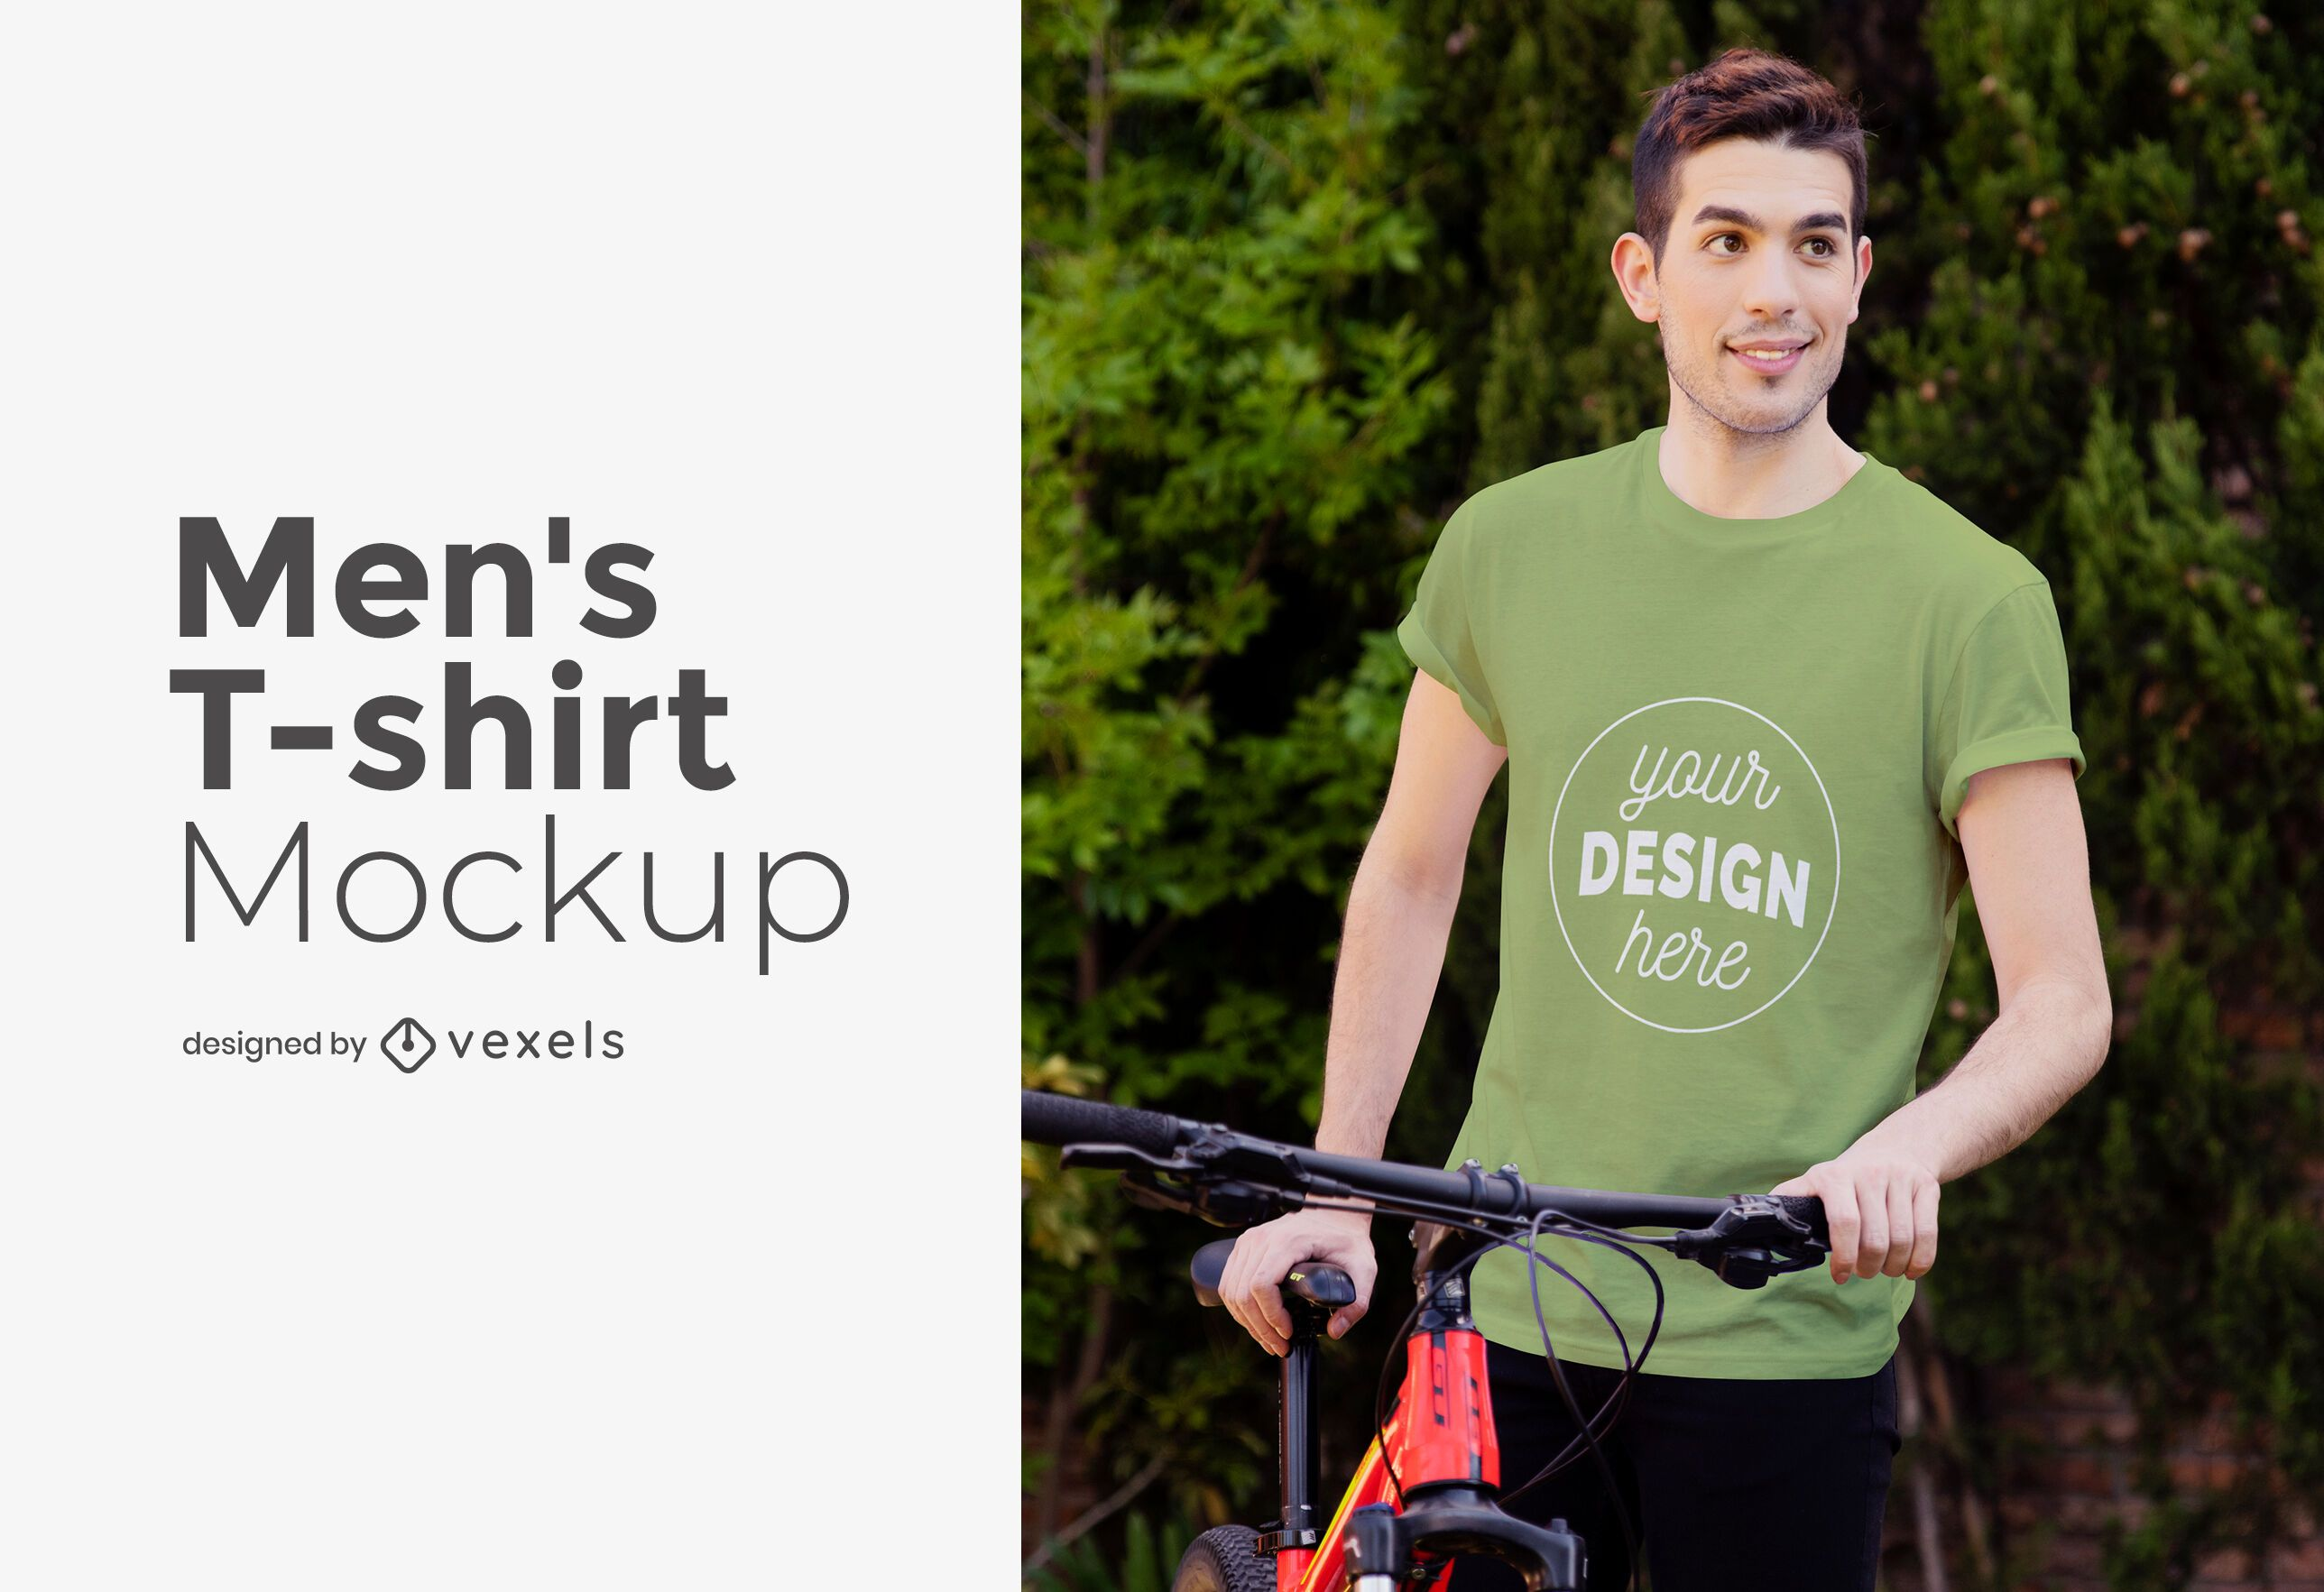 Male model with bike t-shirt mockup